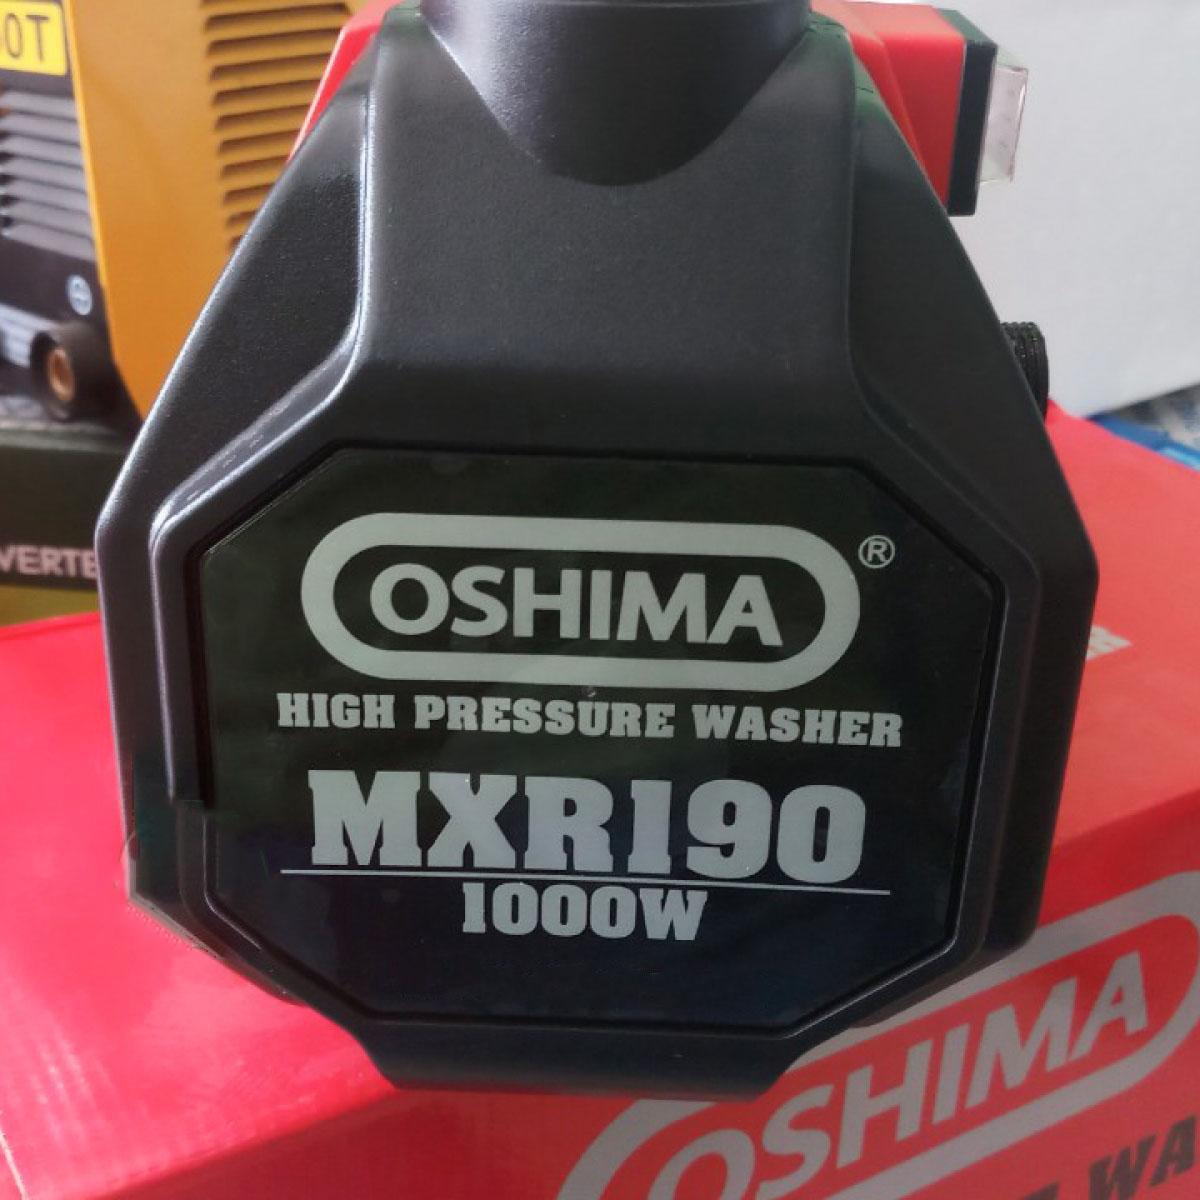 Máy rửa xe Os 190 hiệu Oshima